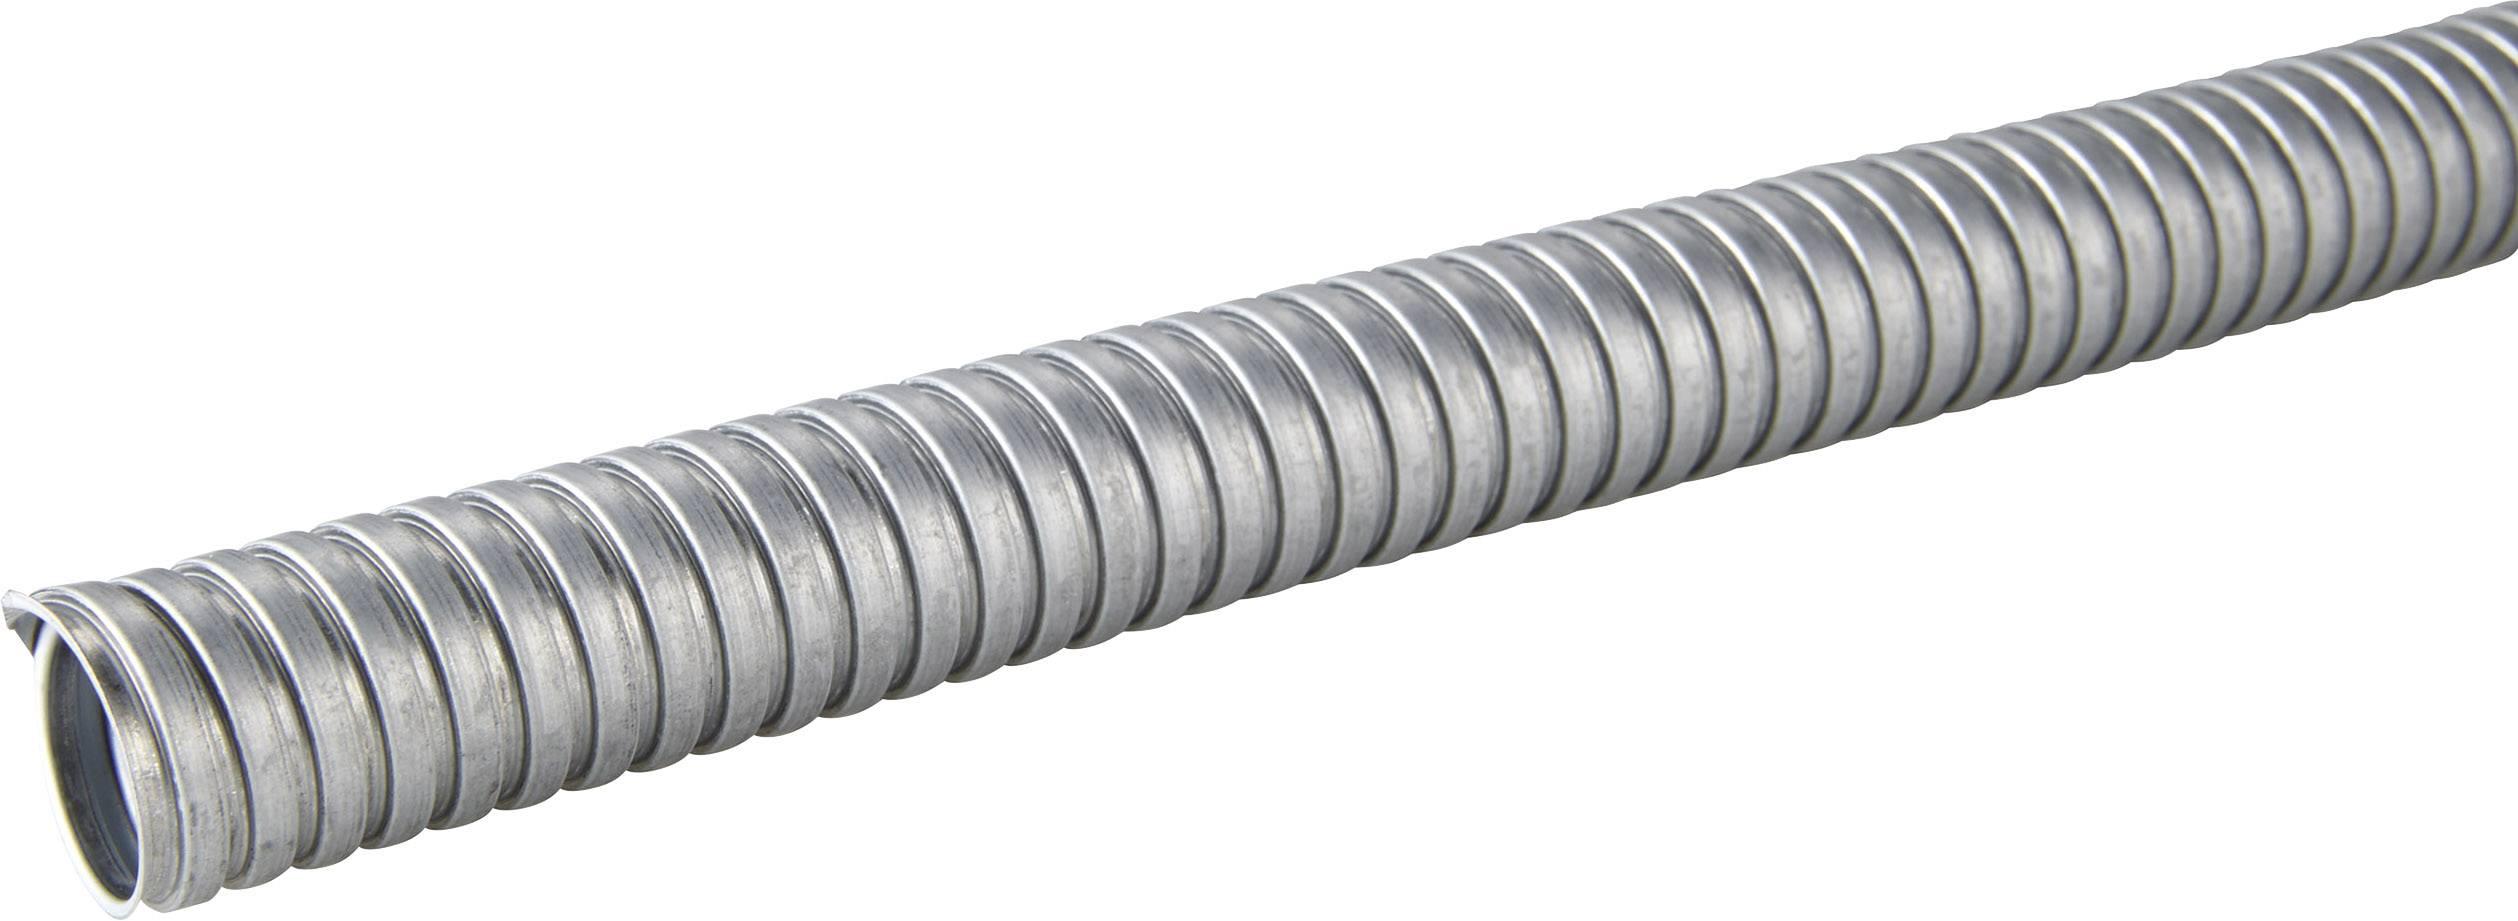 Ochranná hadice na kov LappKabel SILVYN® AS 36/40x45 61802150, stříbrná, 25 m